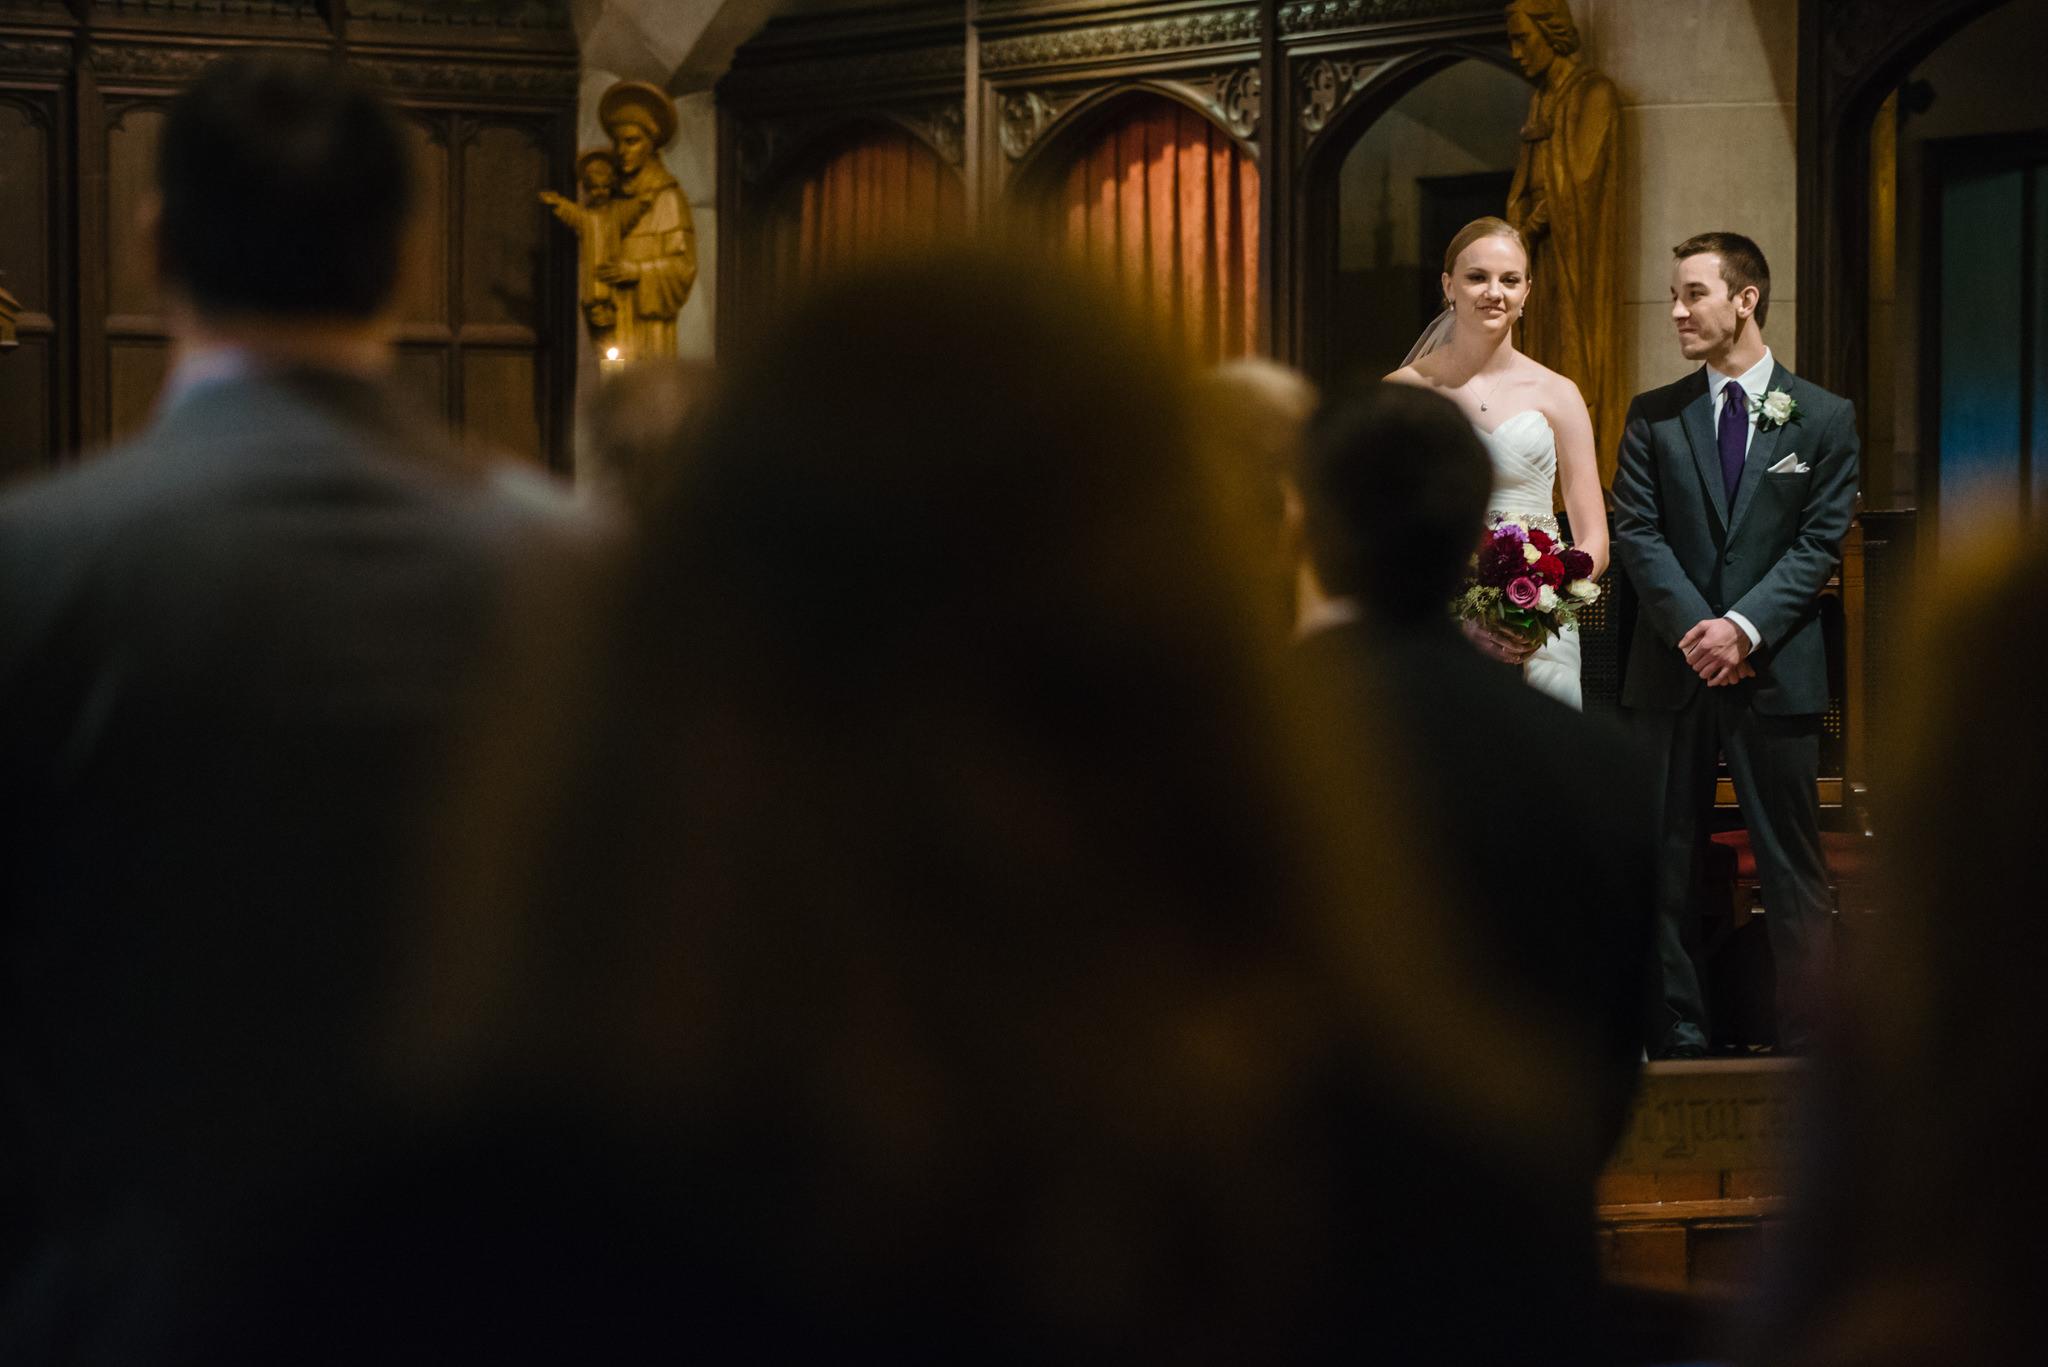 OMAHA-MARRIOTT-WEDDING-DOWNTOWN-MARRIOTT-OMAHA-WEDDING-PHOTOGRAPHER-JM-STUDIOS-015.jpg